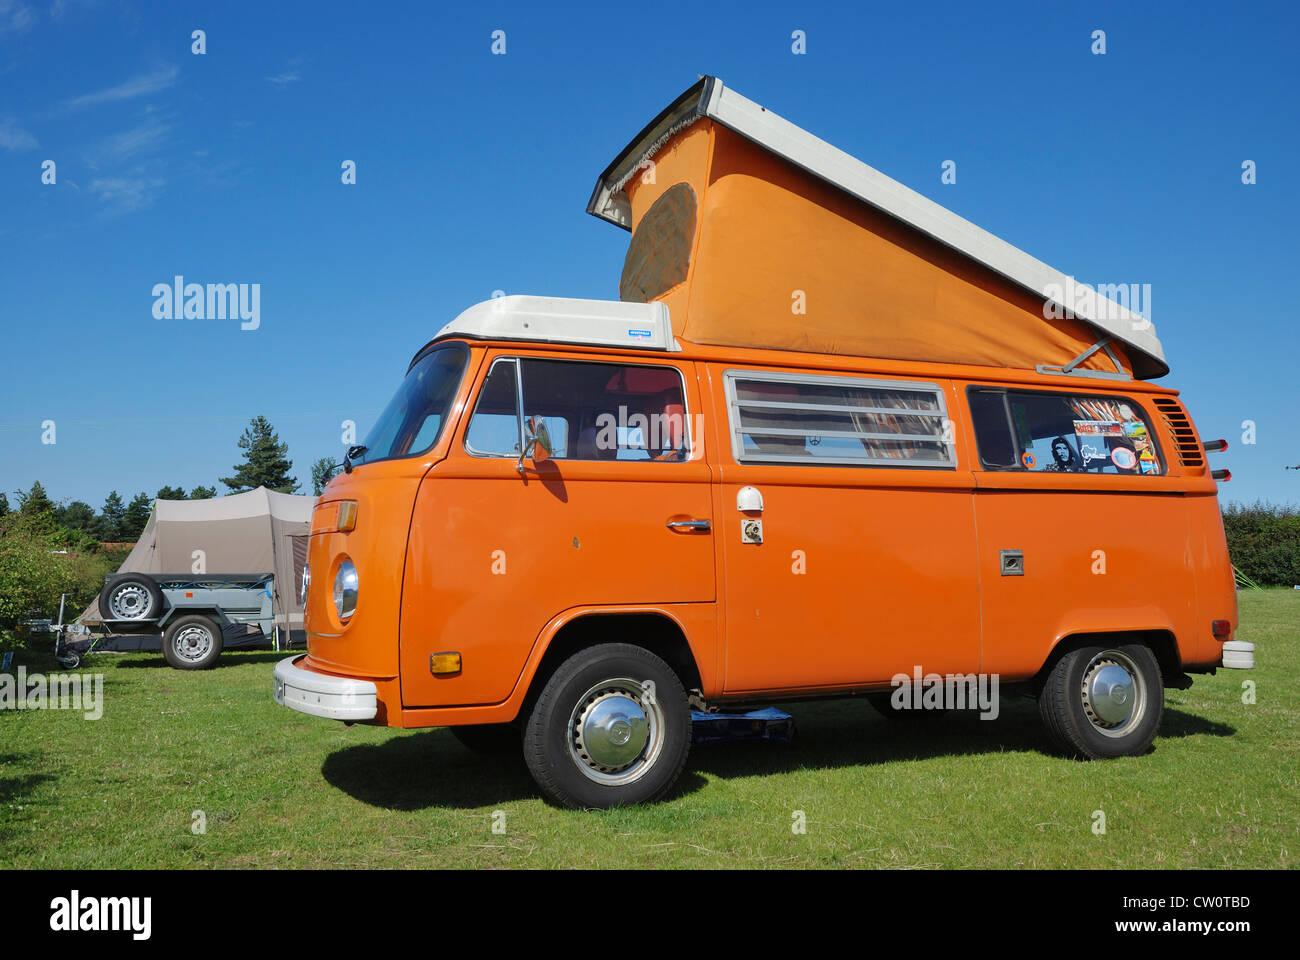 A VW Westfalia 'Early Bay' camper van. - Stock Image